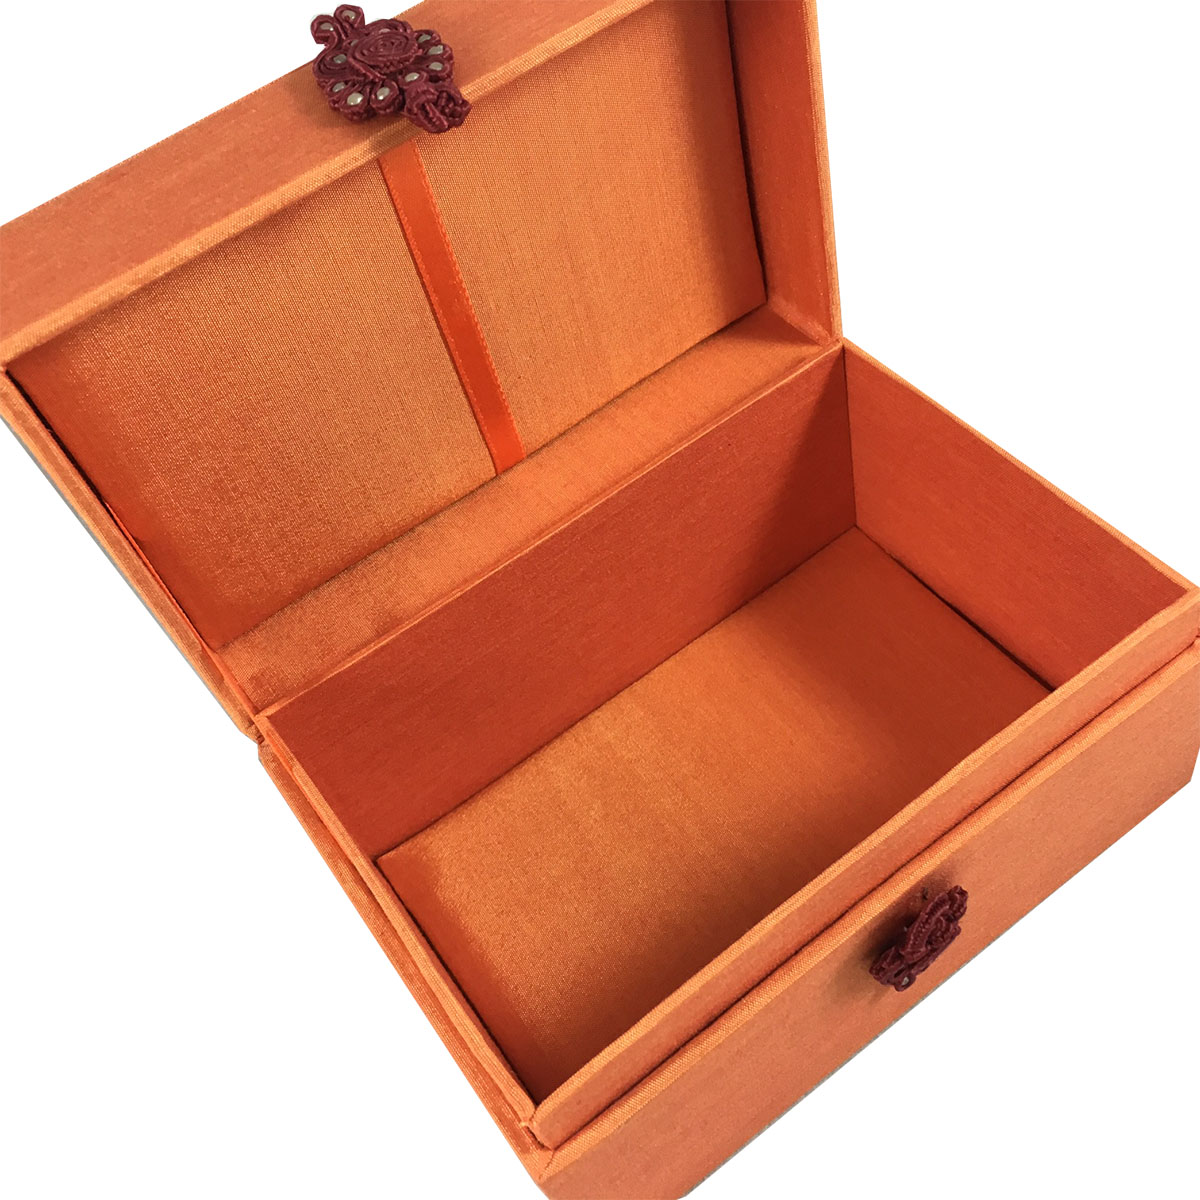 High end packaging box